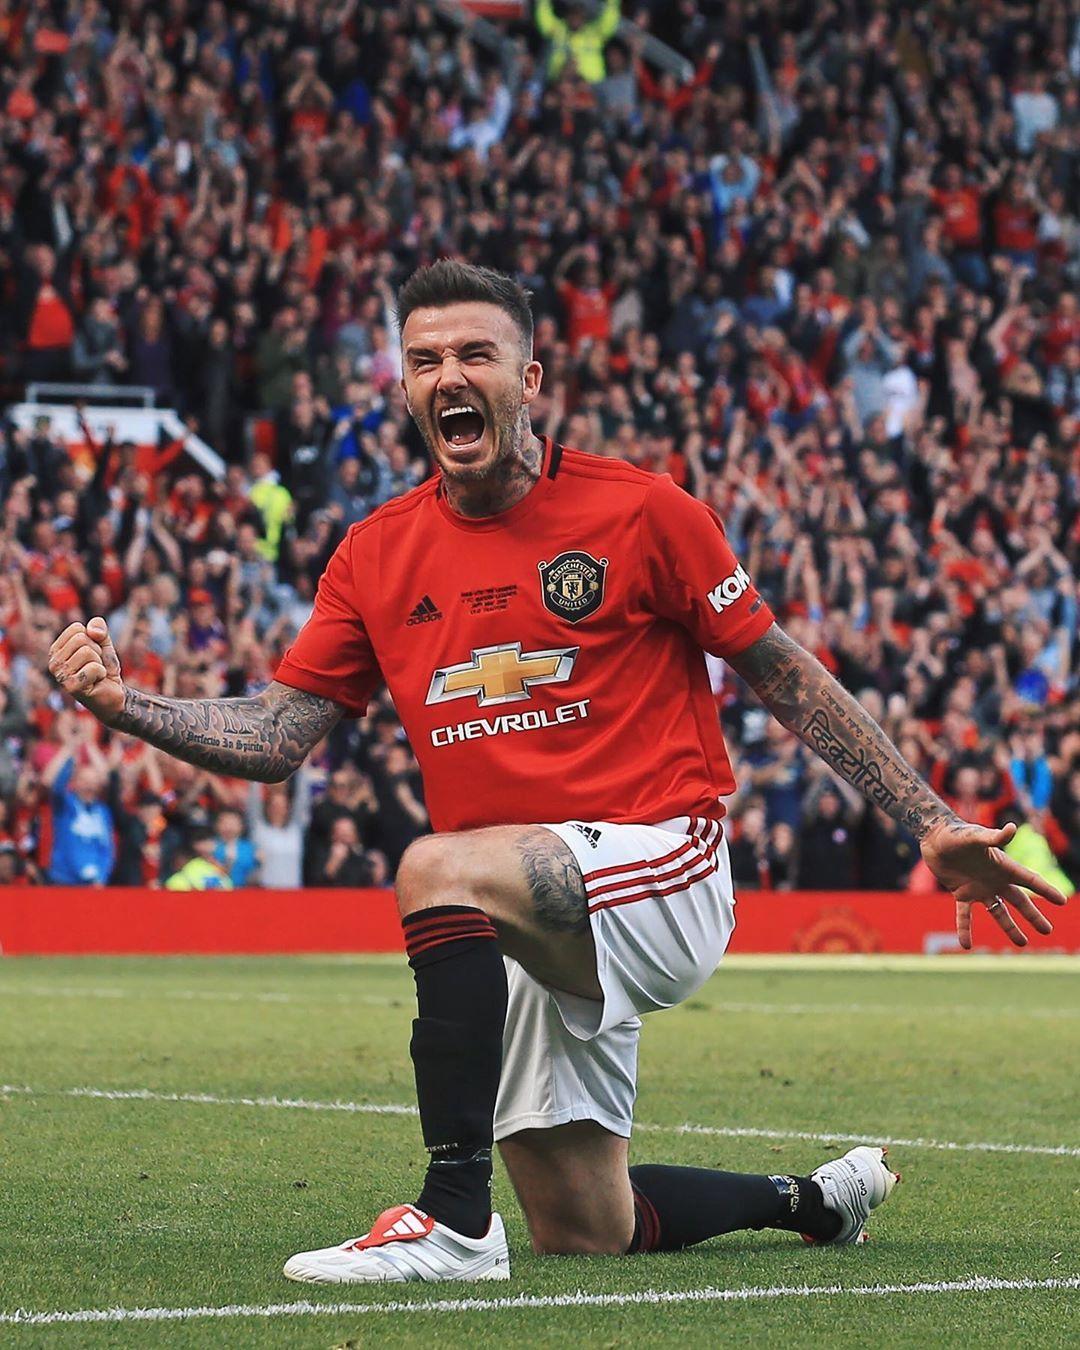 Soccerbible On Instagram Rewind 99 Davidbeckham And Manchesterunited Leg David Beckham Manchester United David Beckham Football Manchester United Legends